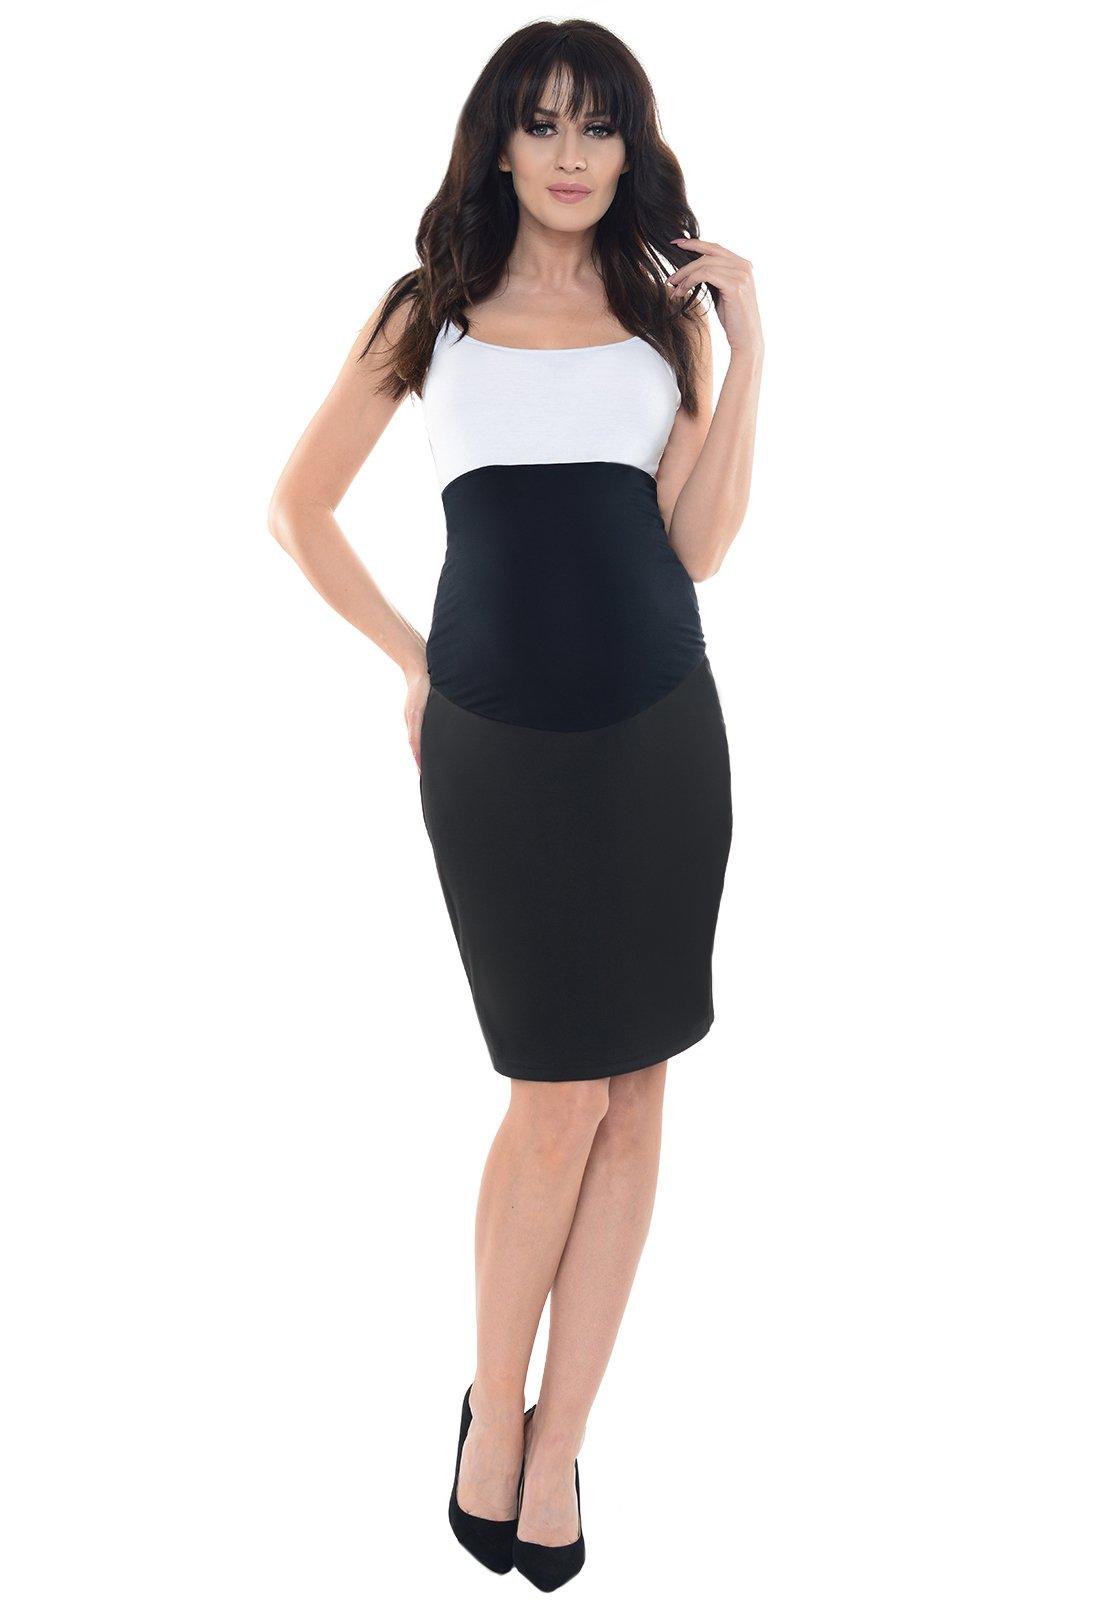 Purpless Maternity Pregnancy Formal Pencil Skirt 1504 (8, Black)